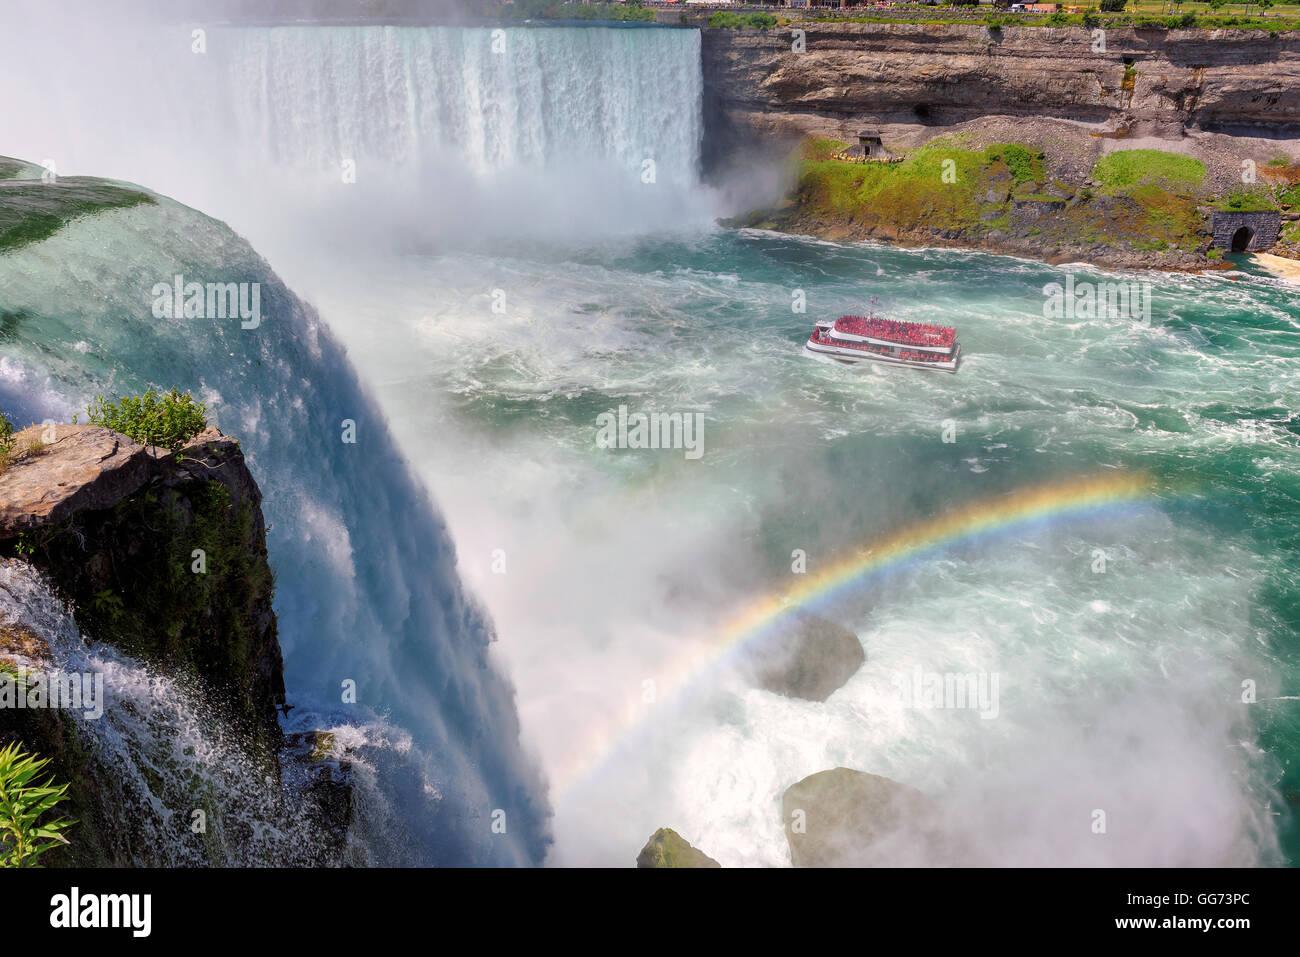 Niagara Falls, rainbow and tourist ship - Stock Image